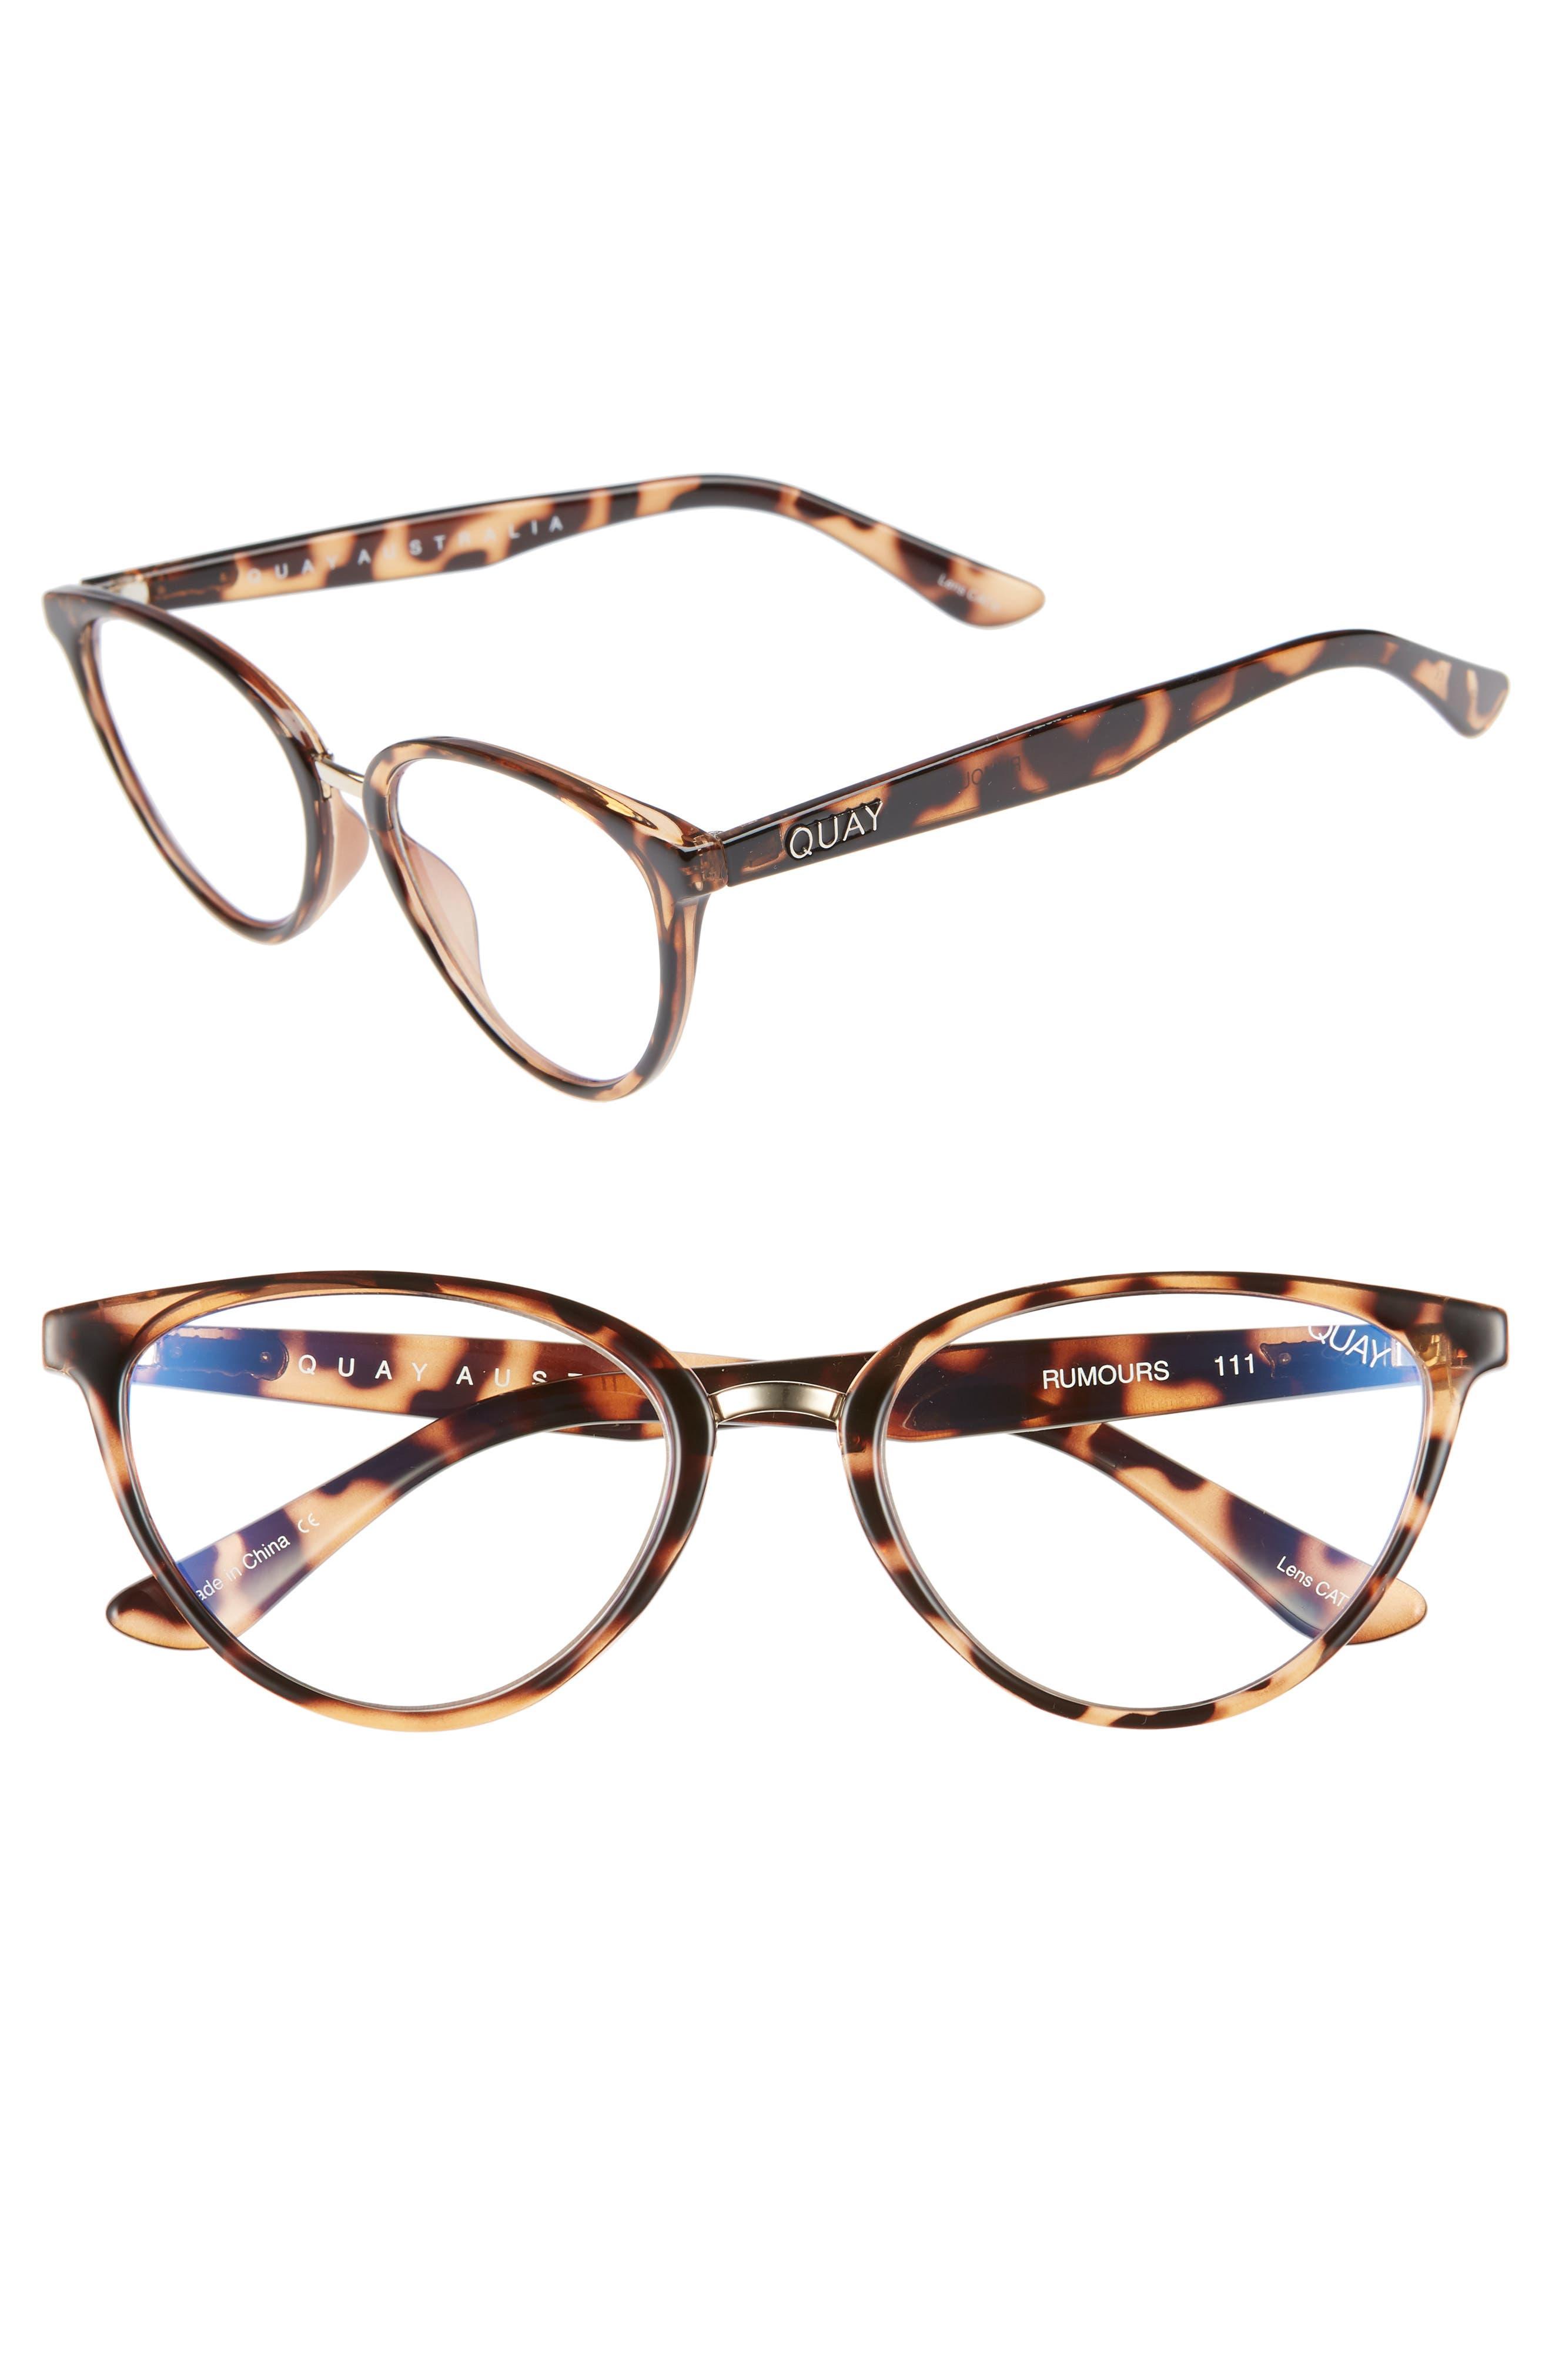 Quay Australia Rumors 57Mm Sunglasses -